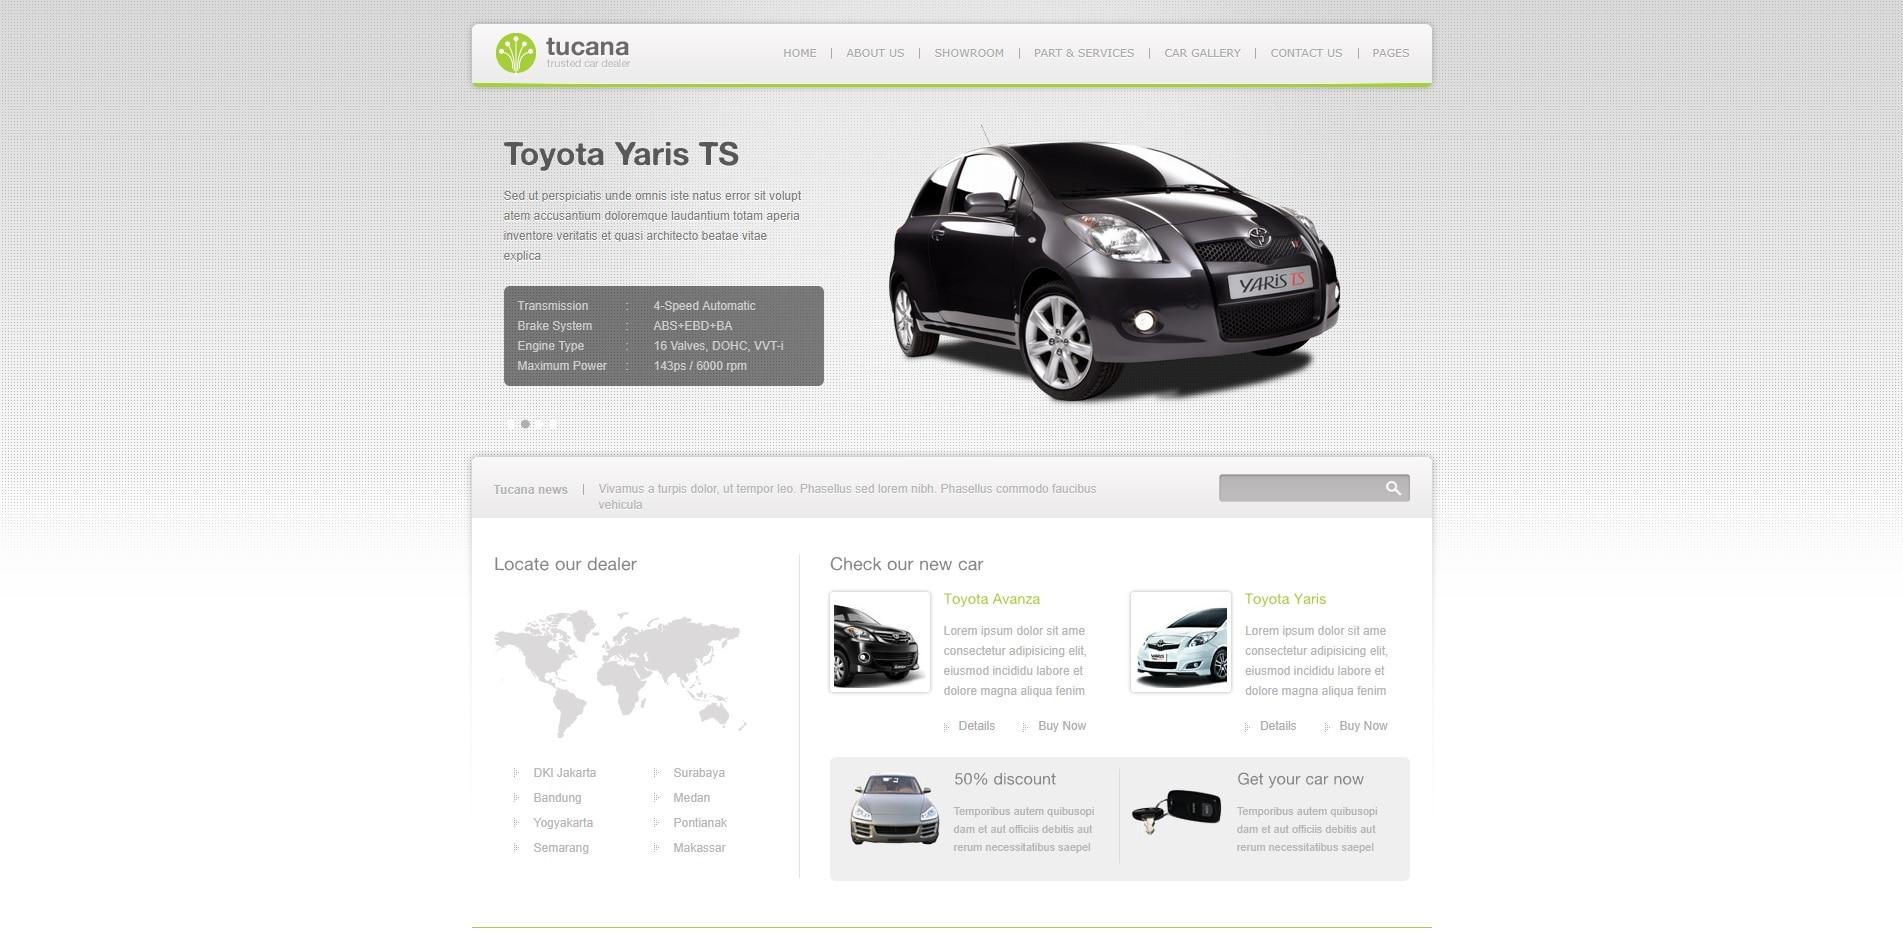 tucana car dealer website template